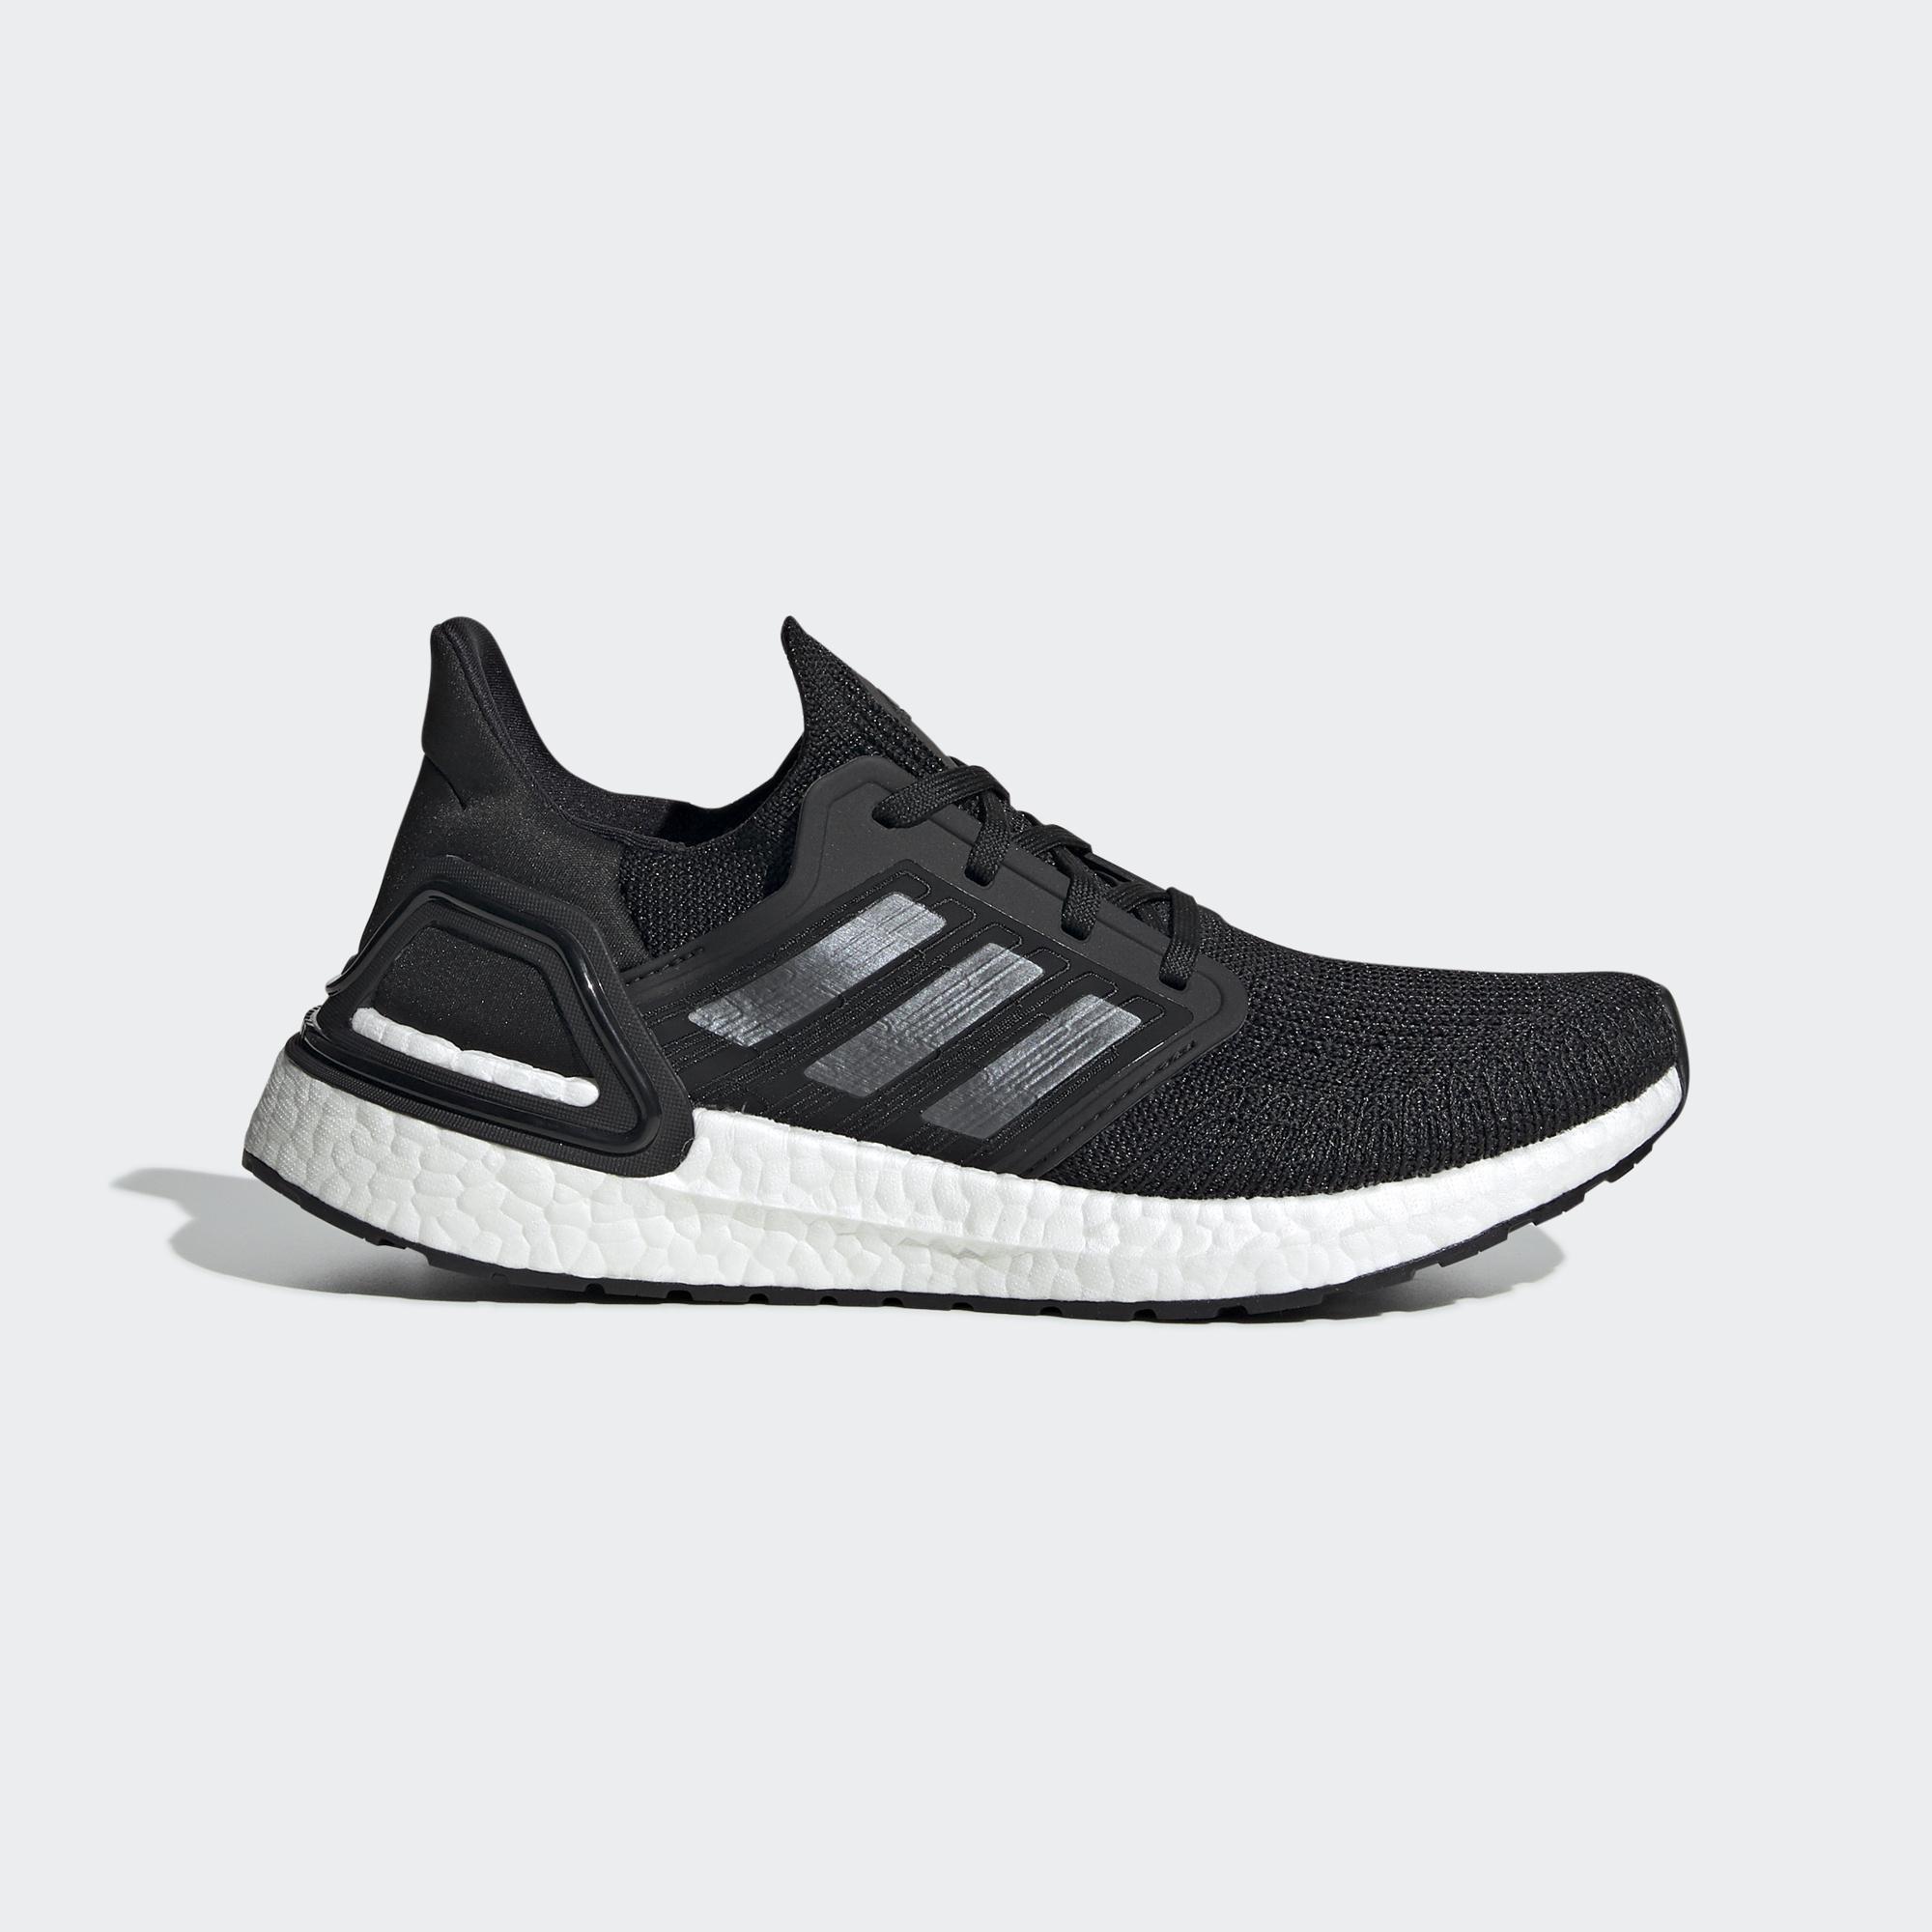 Ultraboost 20 跑鞋